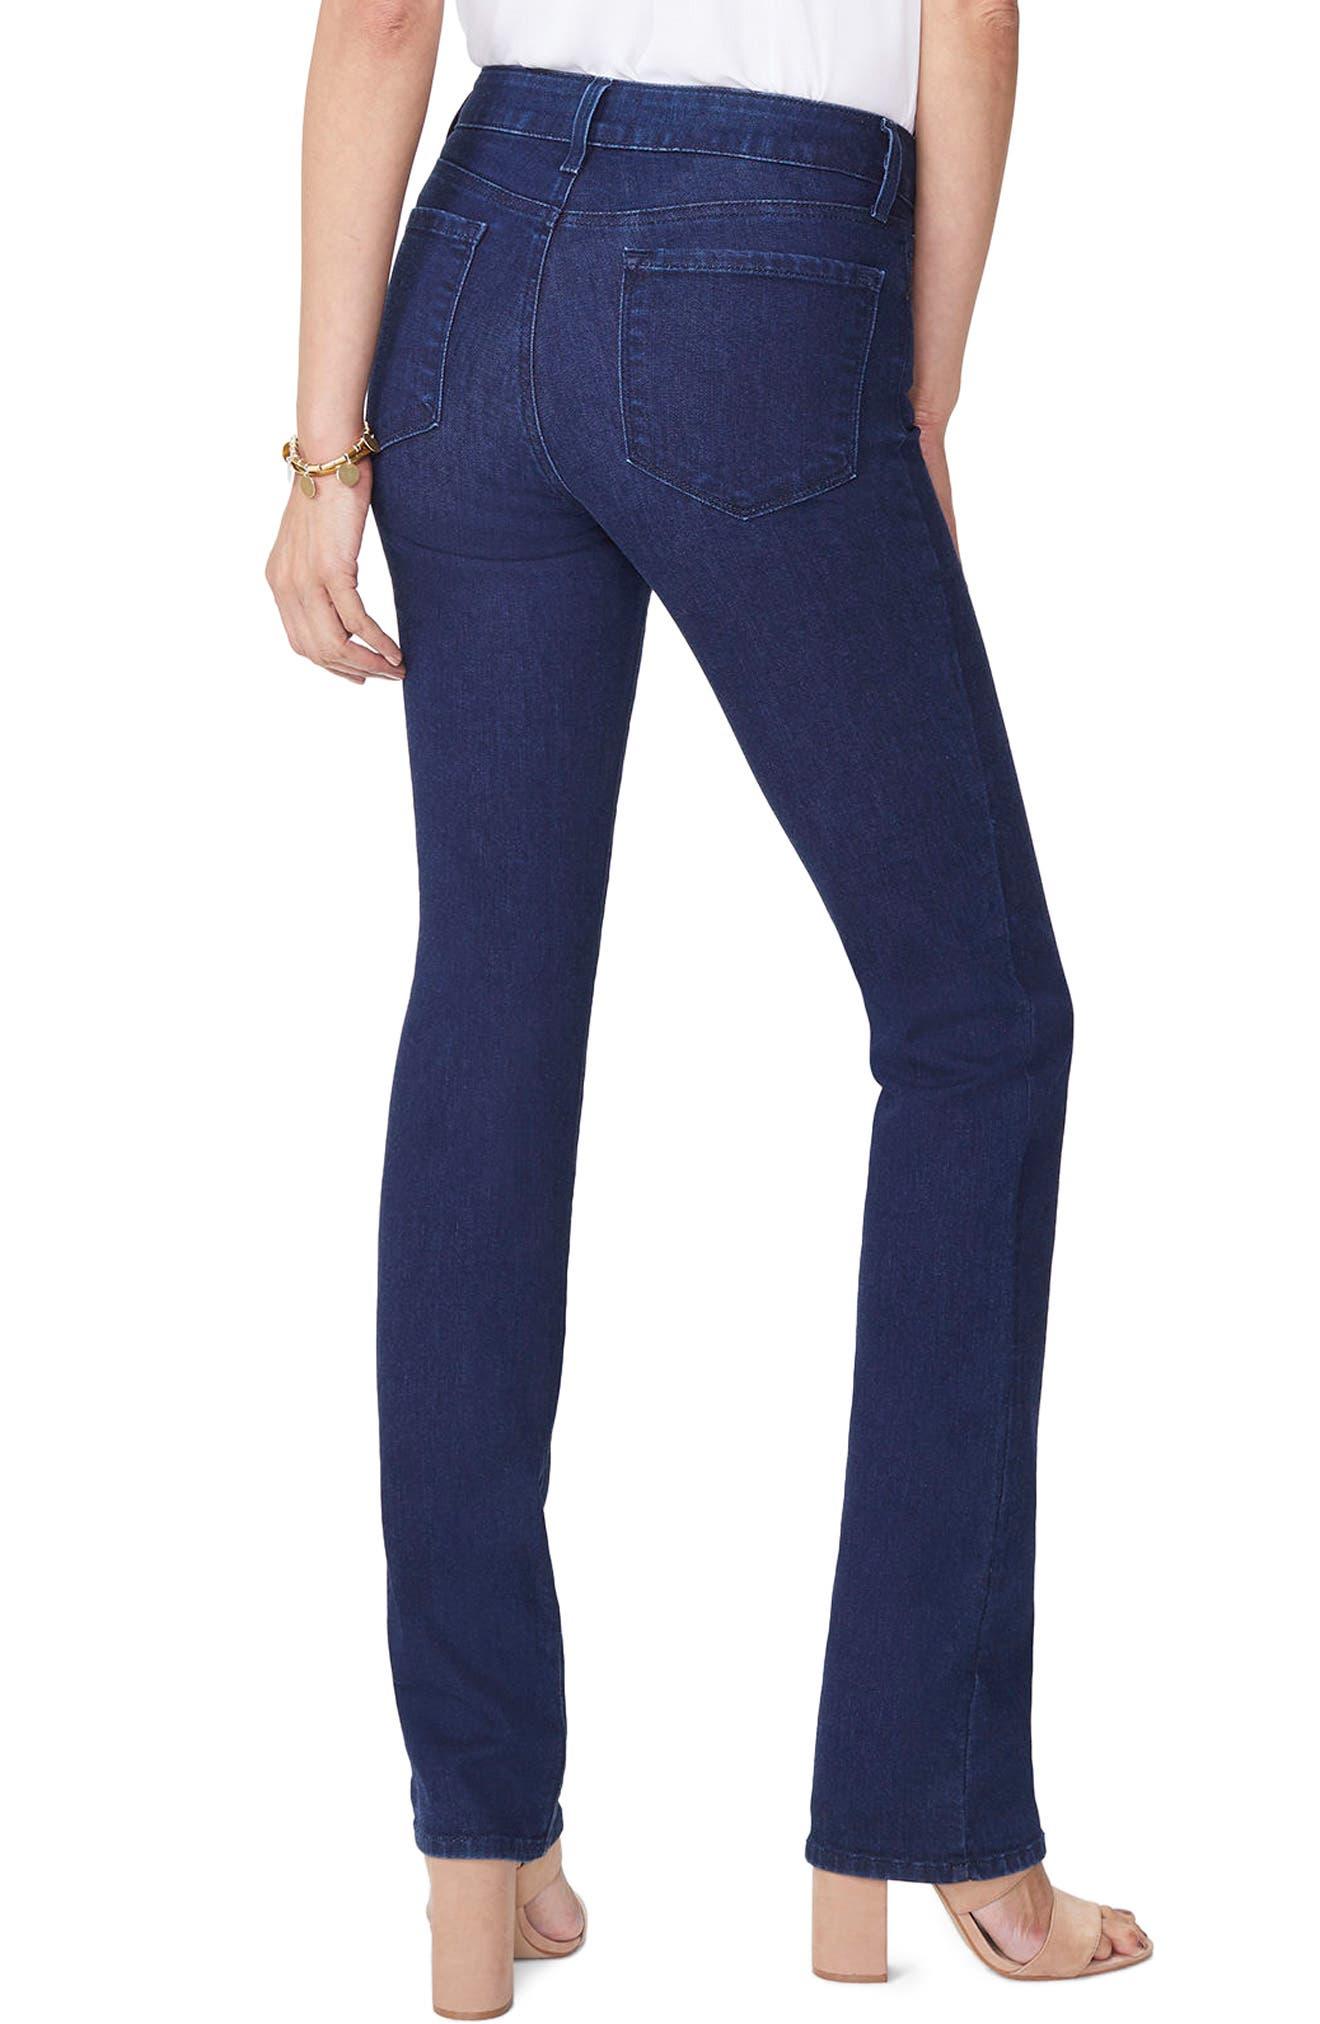 Marilyn High Waist Stretch Straight Leg Jeans,                             Alternate thumbnail 2, color,                             RINSE